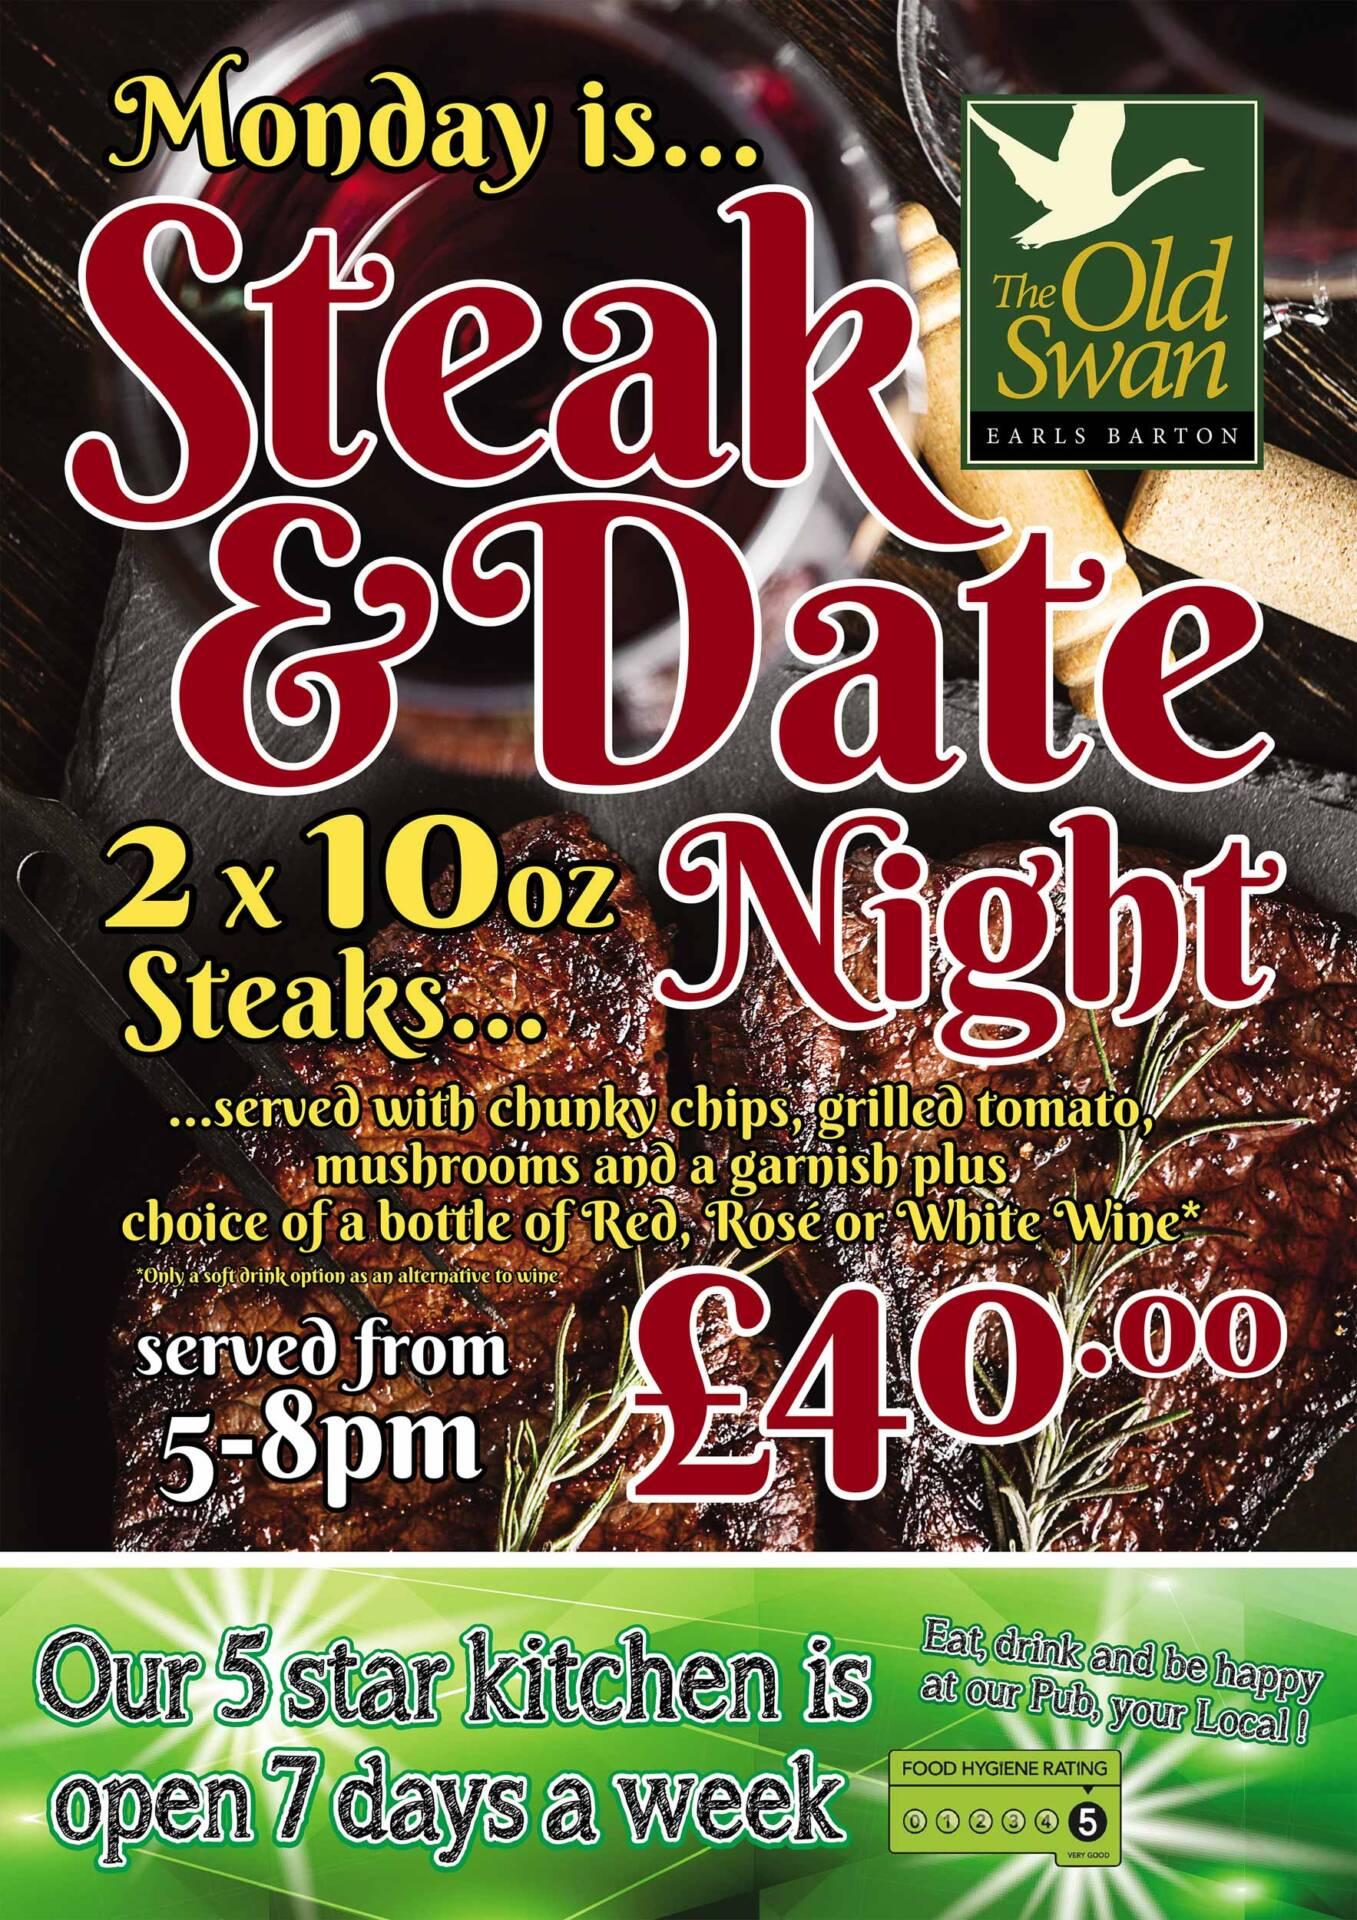 steak and date night